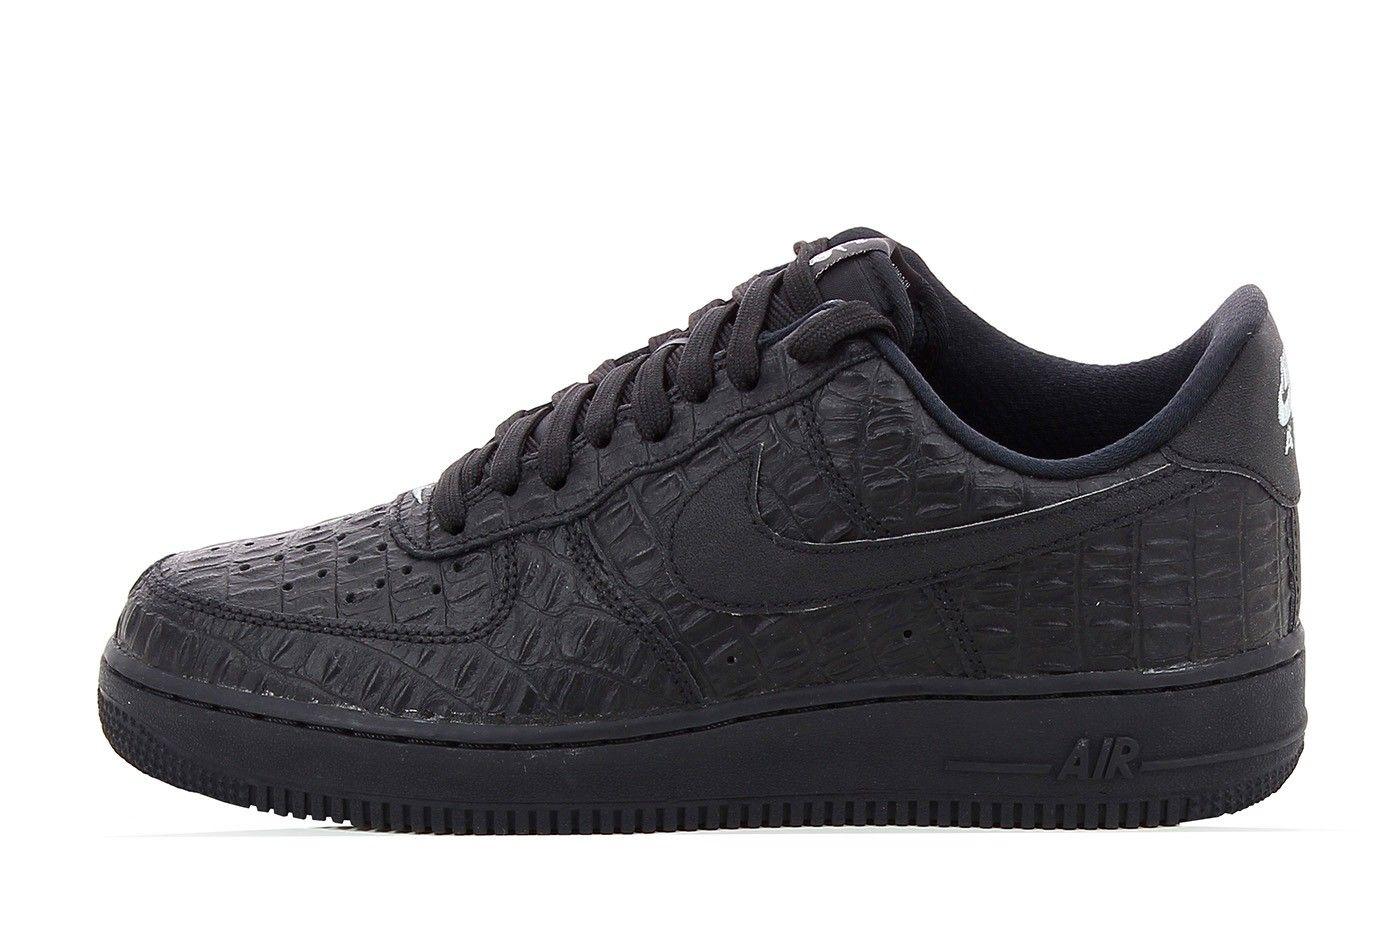 online store 50a2c 8a3e2 Basket Nike Air Force 1 Low 07 LV8 - 718152-007 - Pegashoes